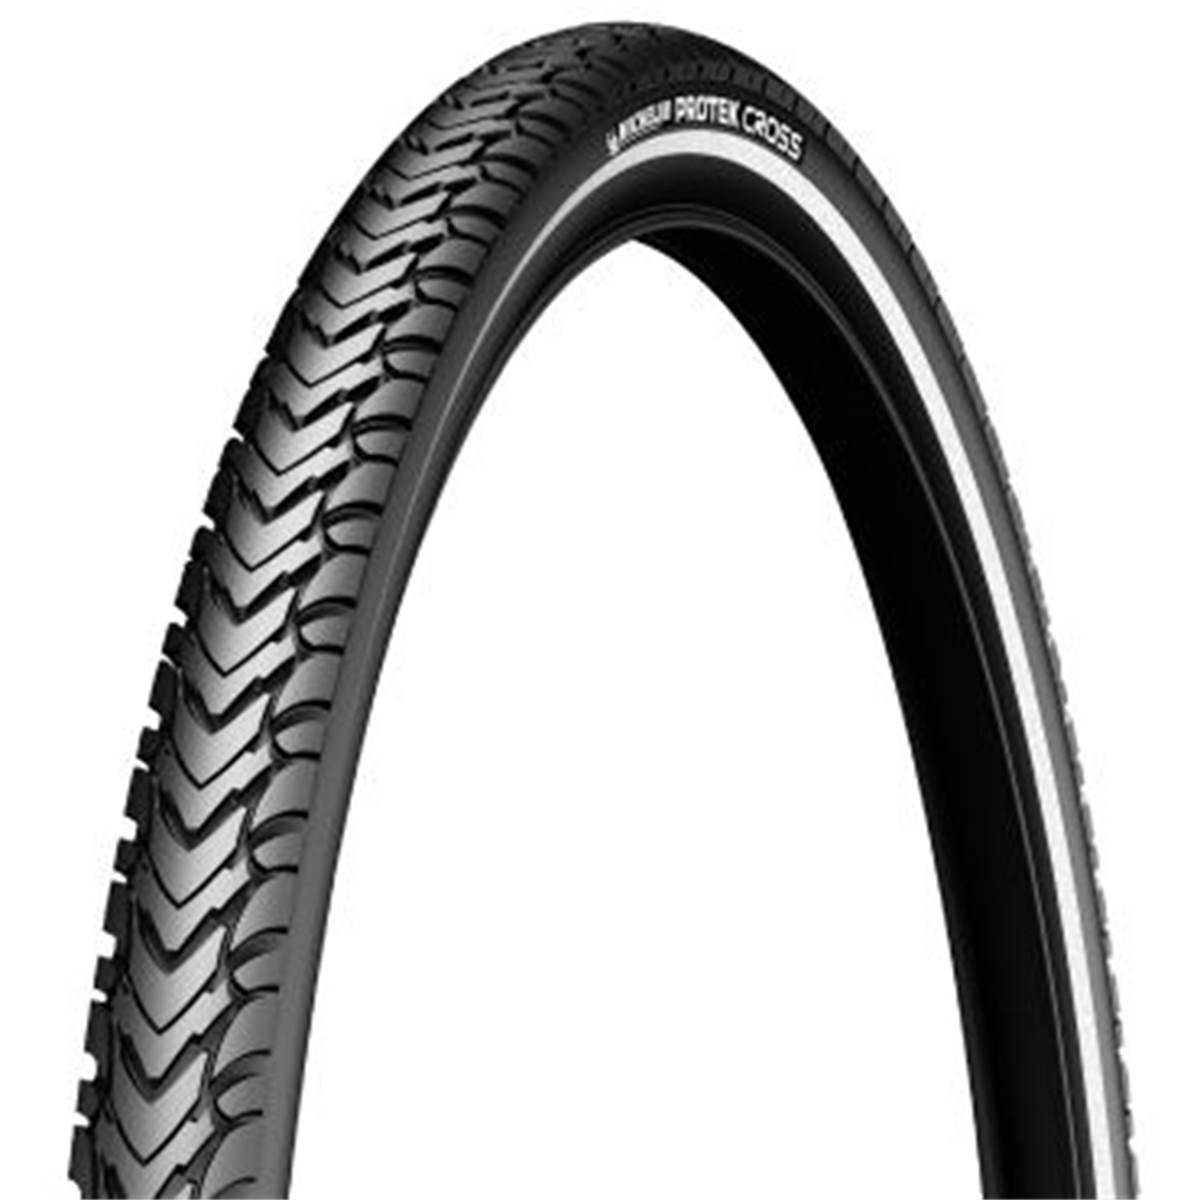 Pneu 700 x 40 Protek Cross Michelin pour vélo